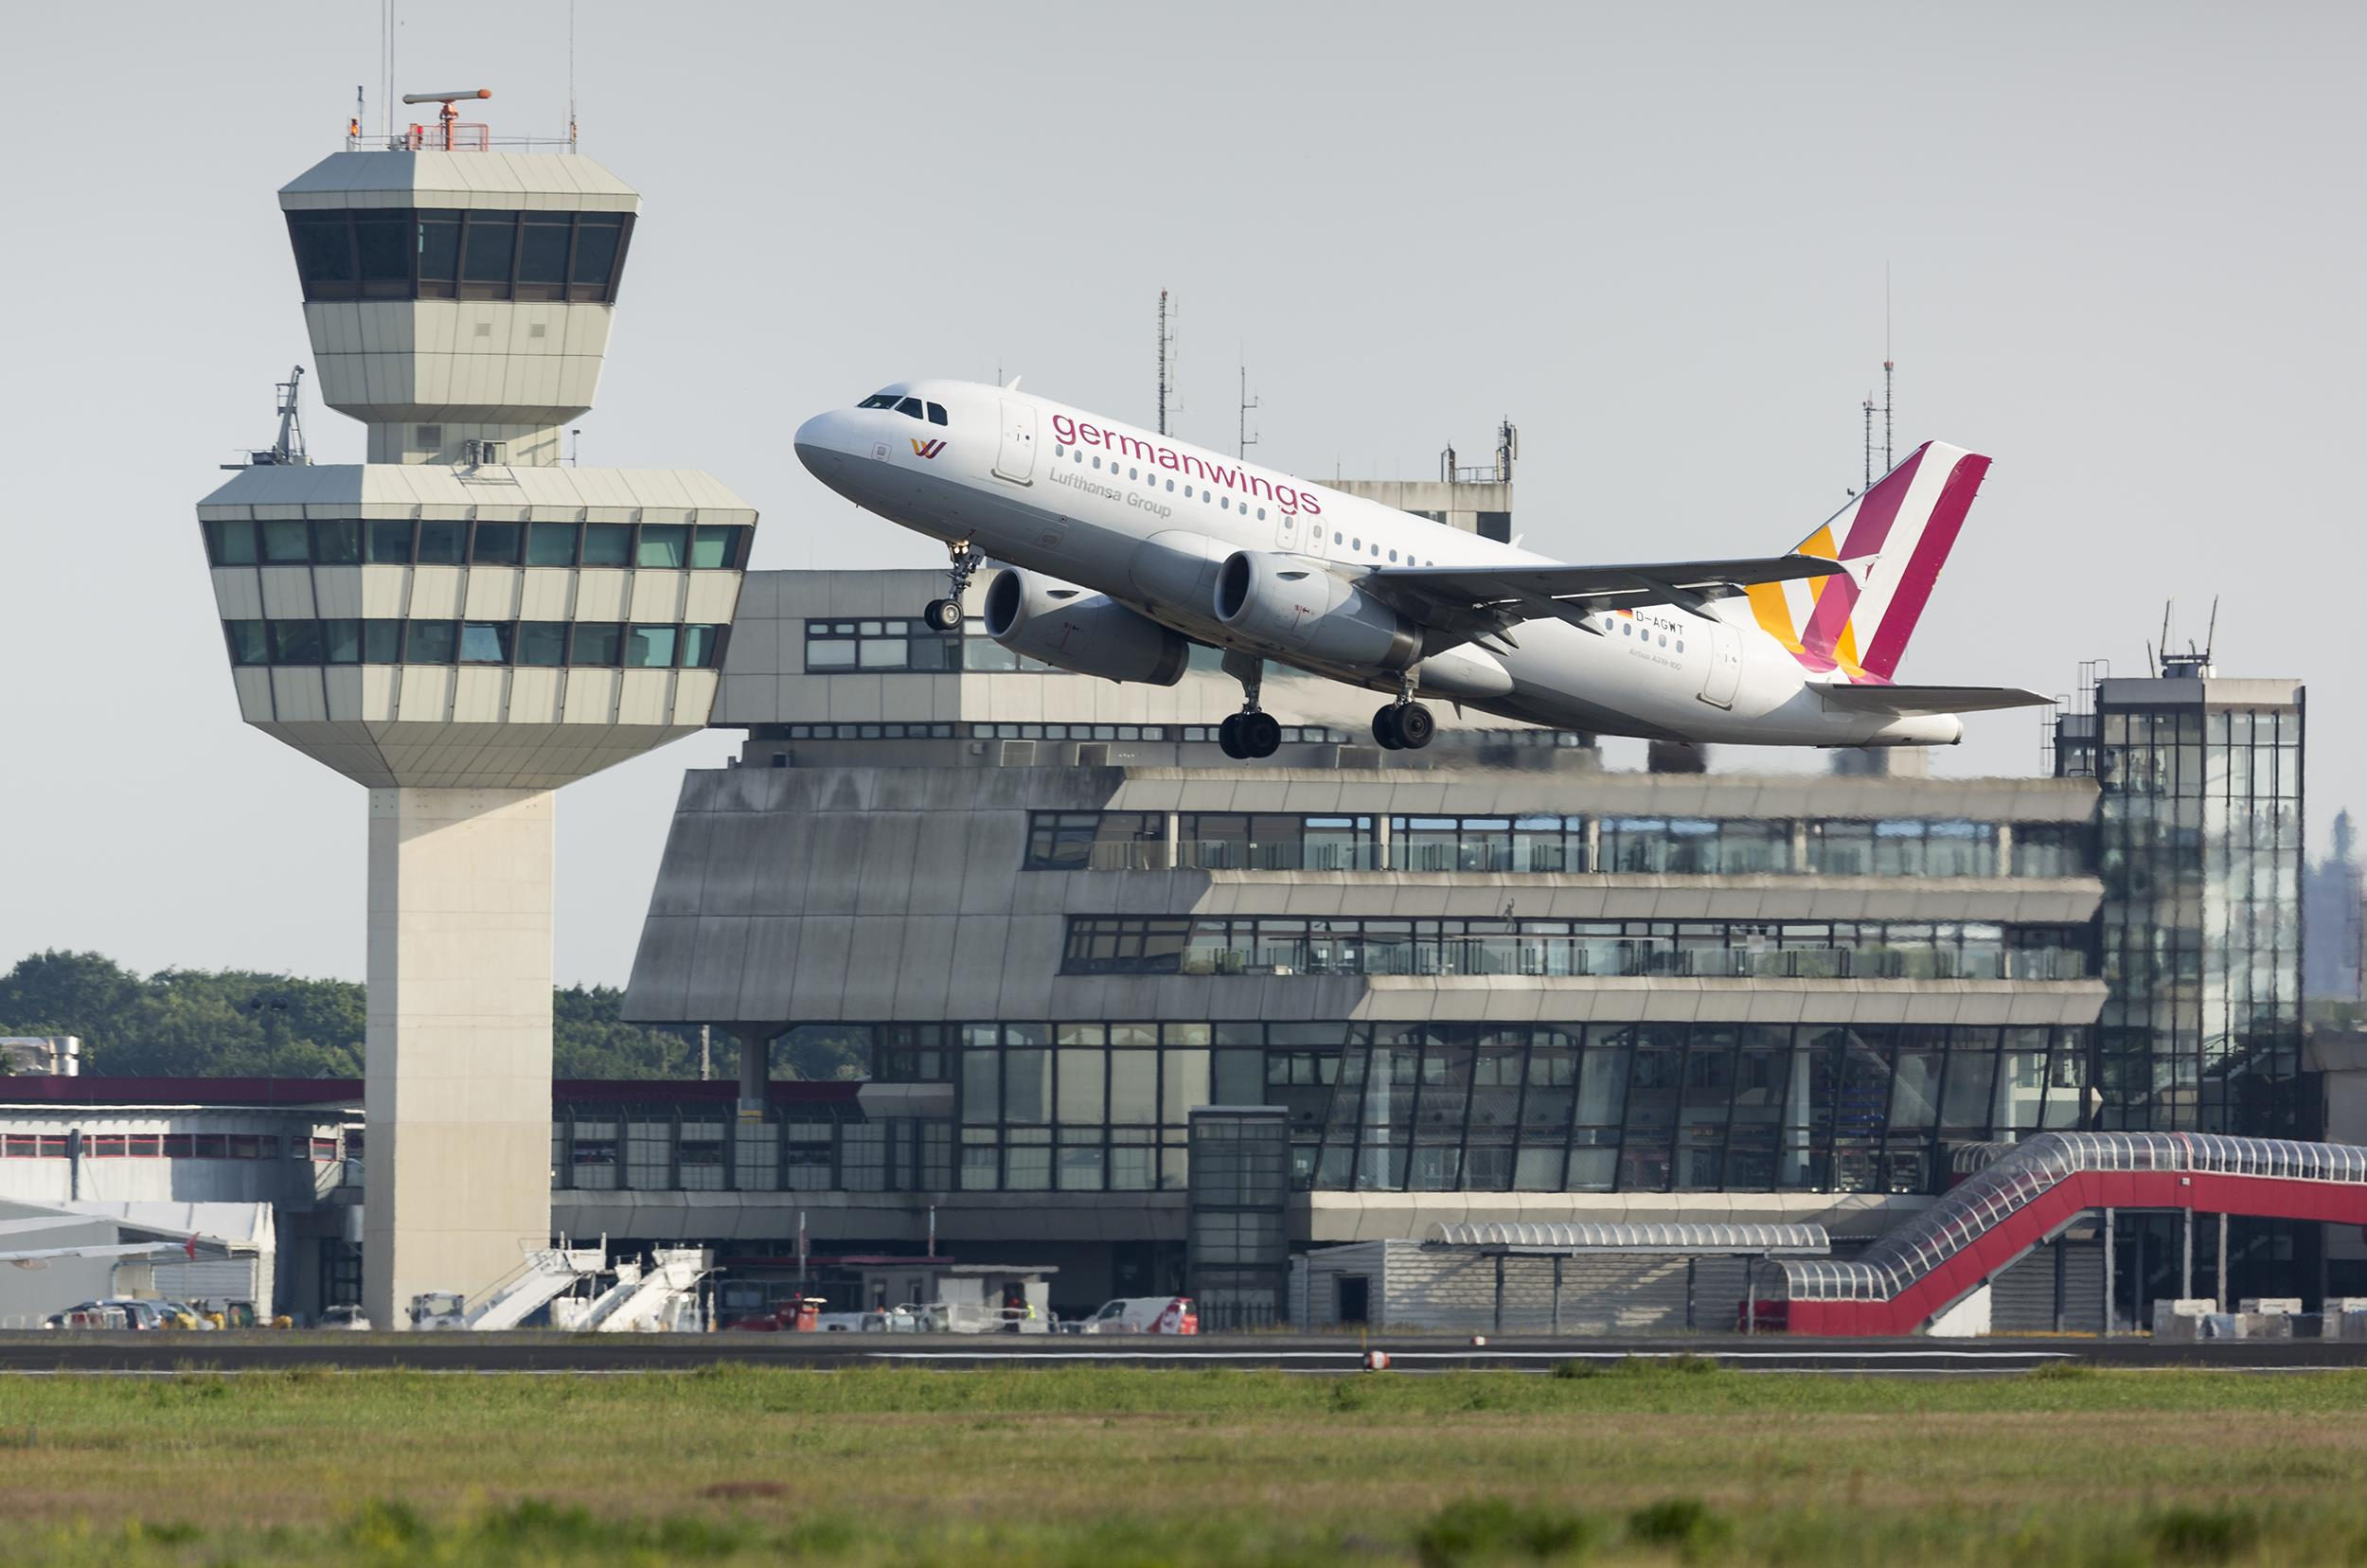 Remote-Controlled Jets? Tragic Crash Prompts Debate